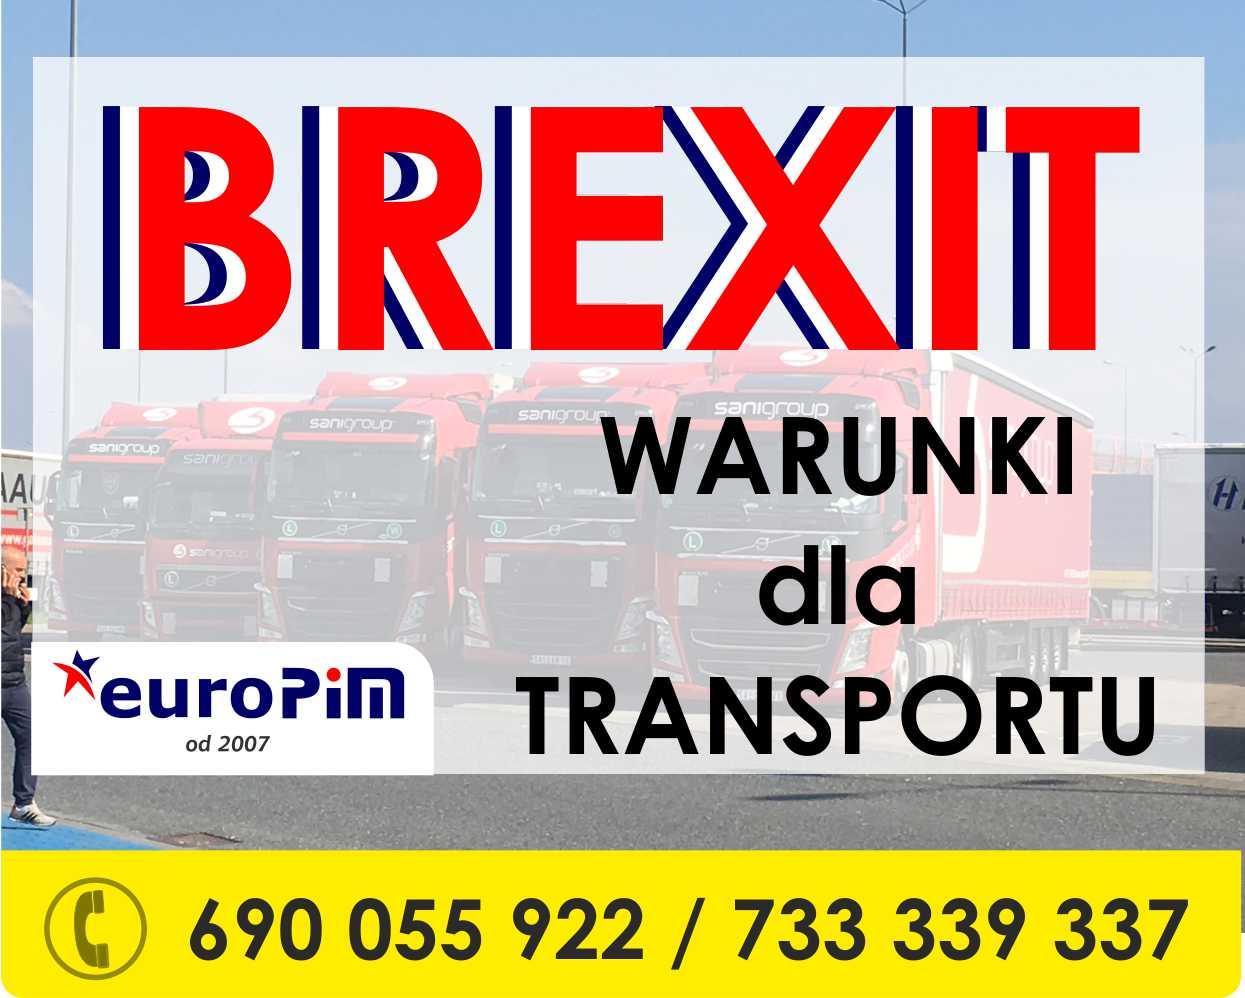 BREXIT dla TRANSPORTU – 01.01.2021